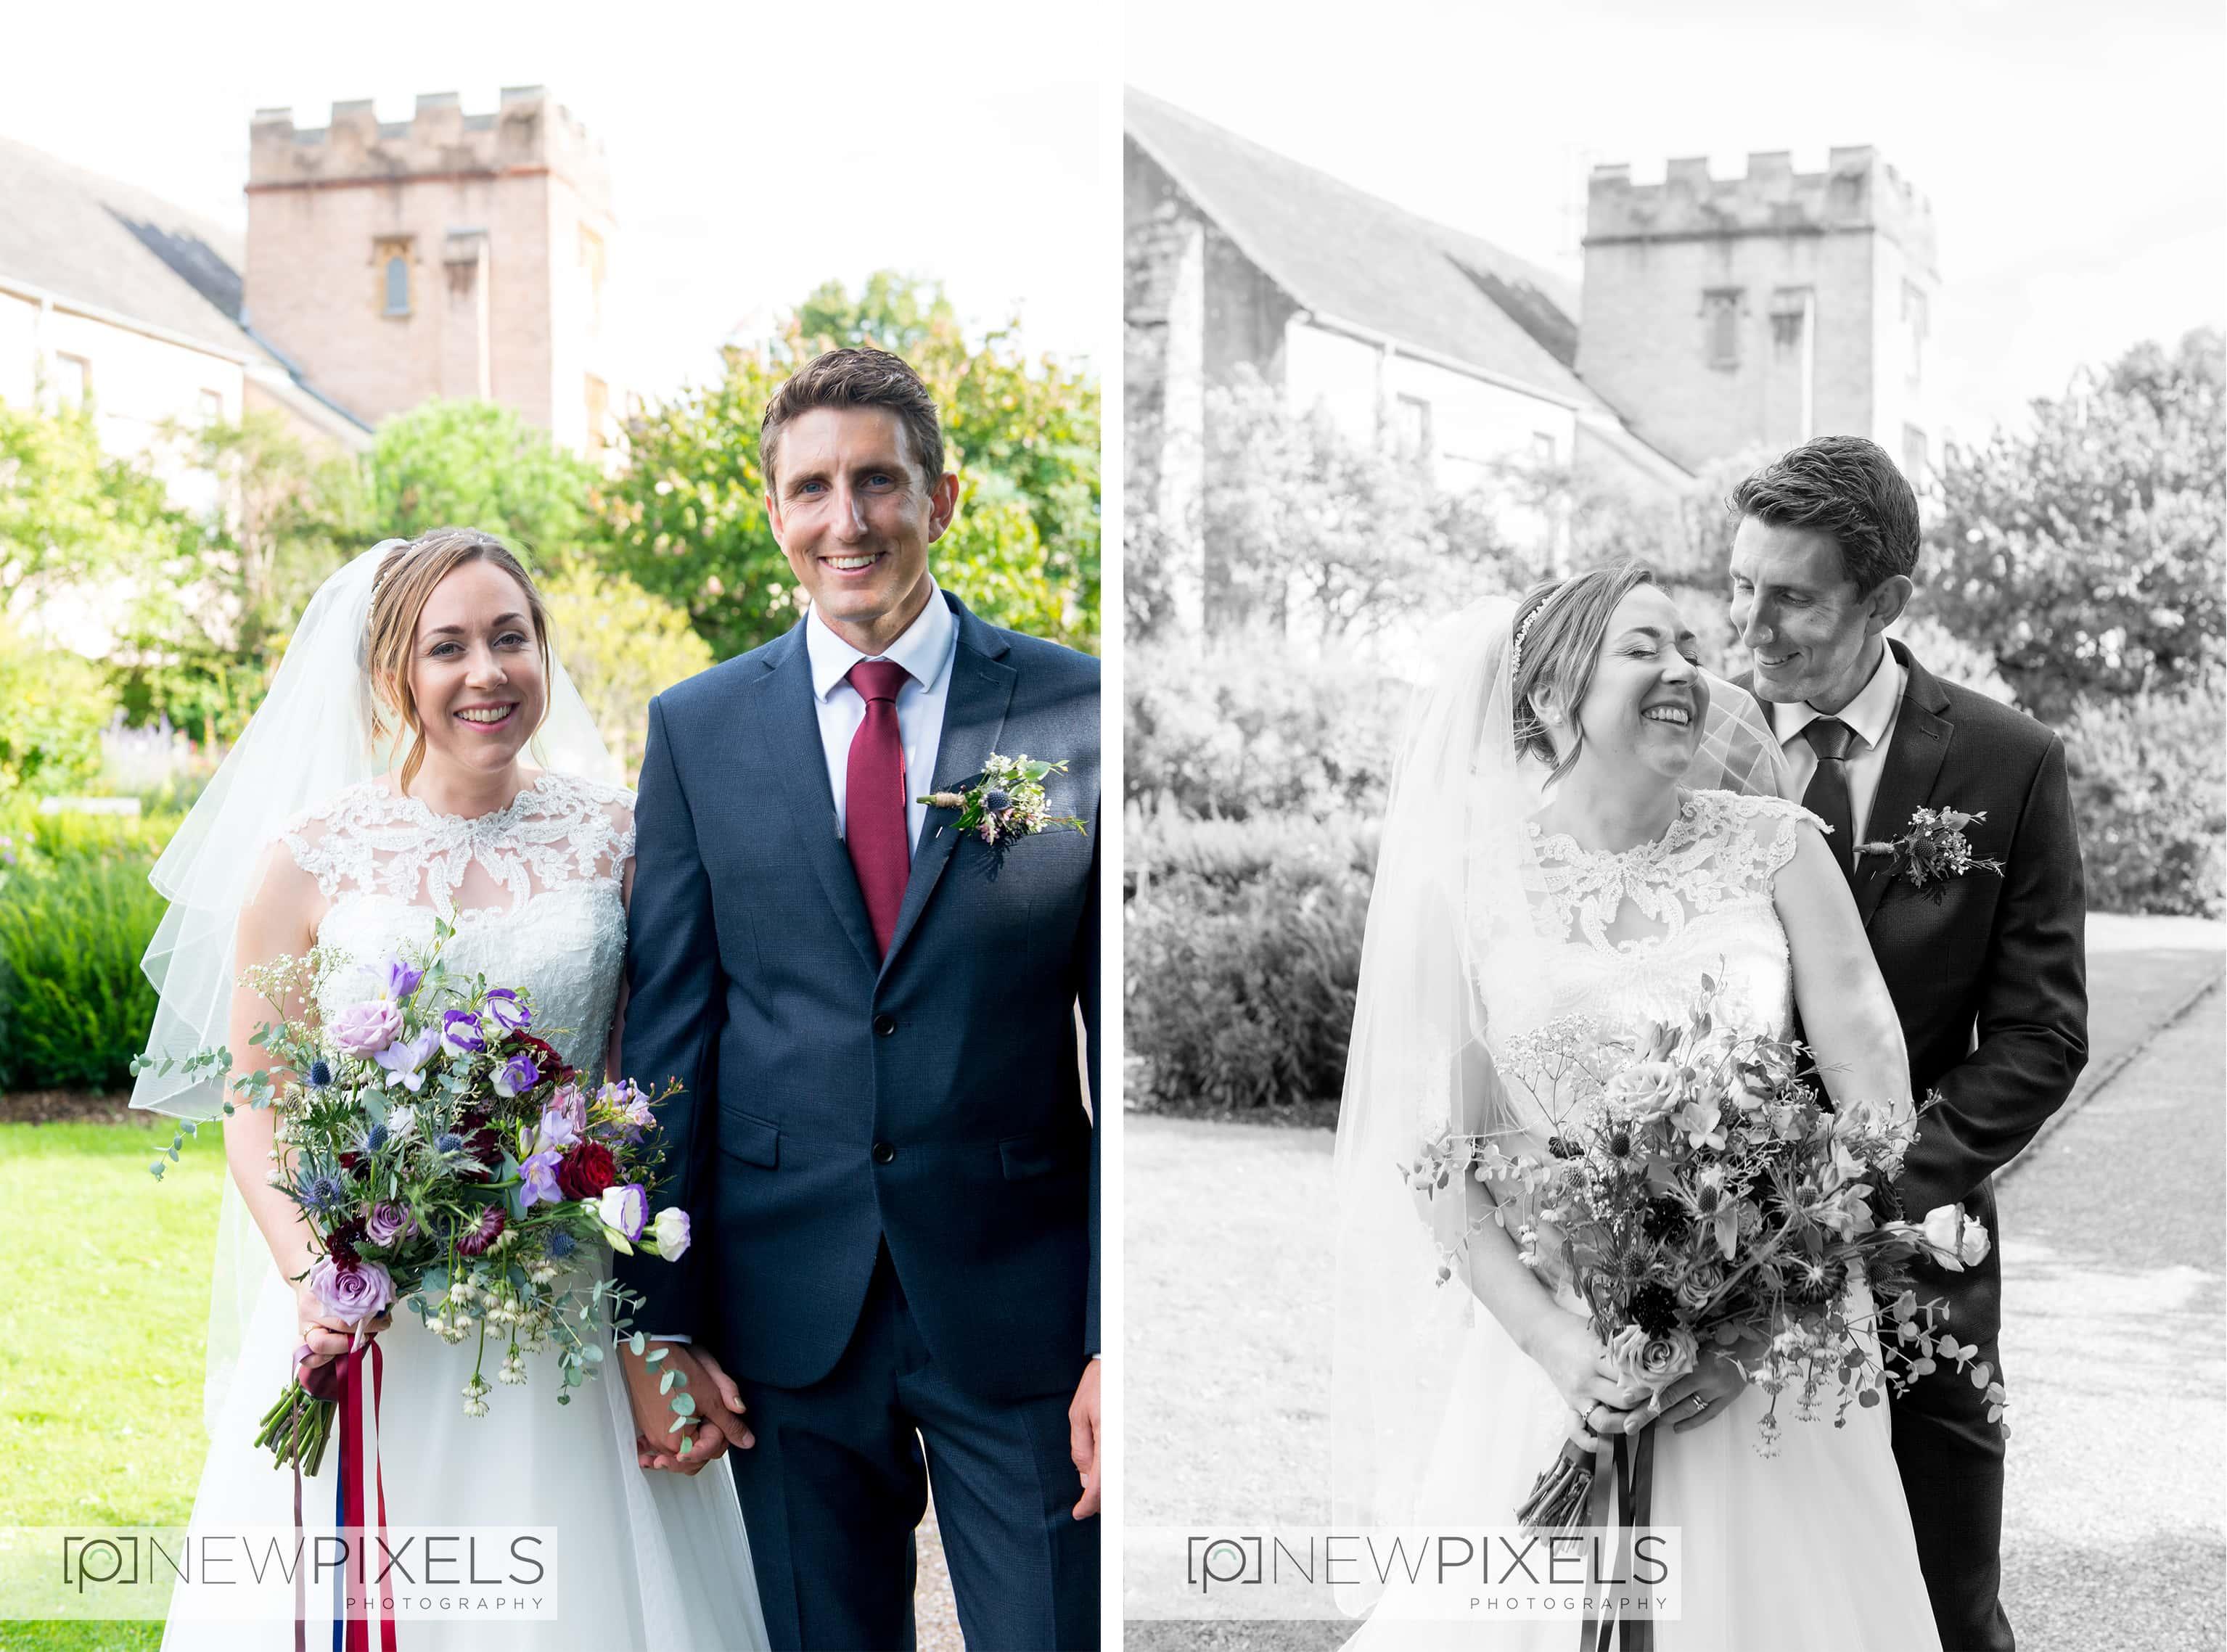 Hertfordshire Wedding Photographer16